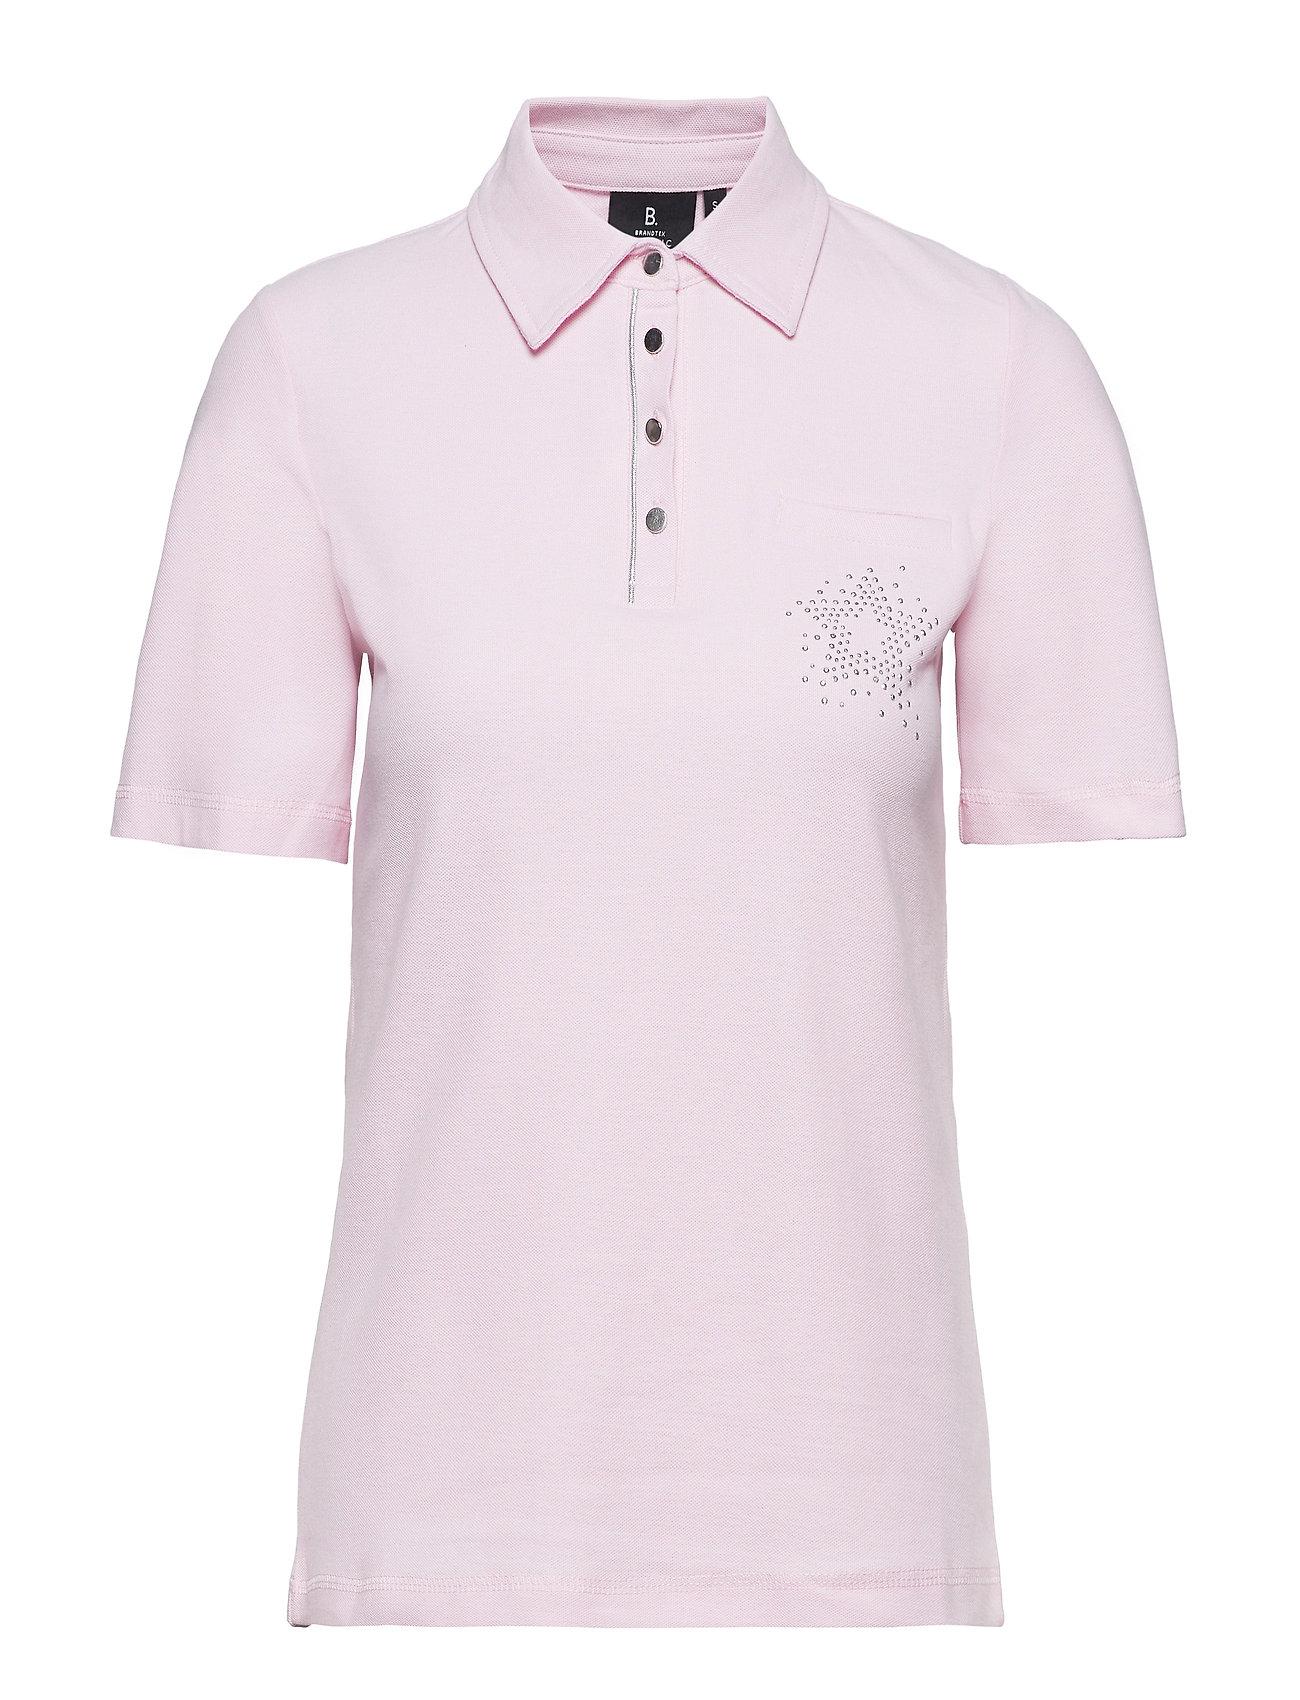 Brandtex Polo Shirt - PEARL ROSE